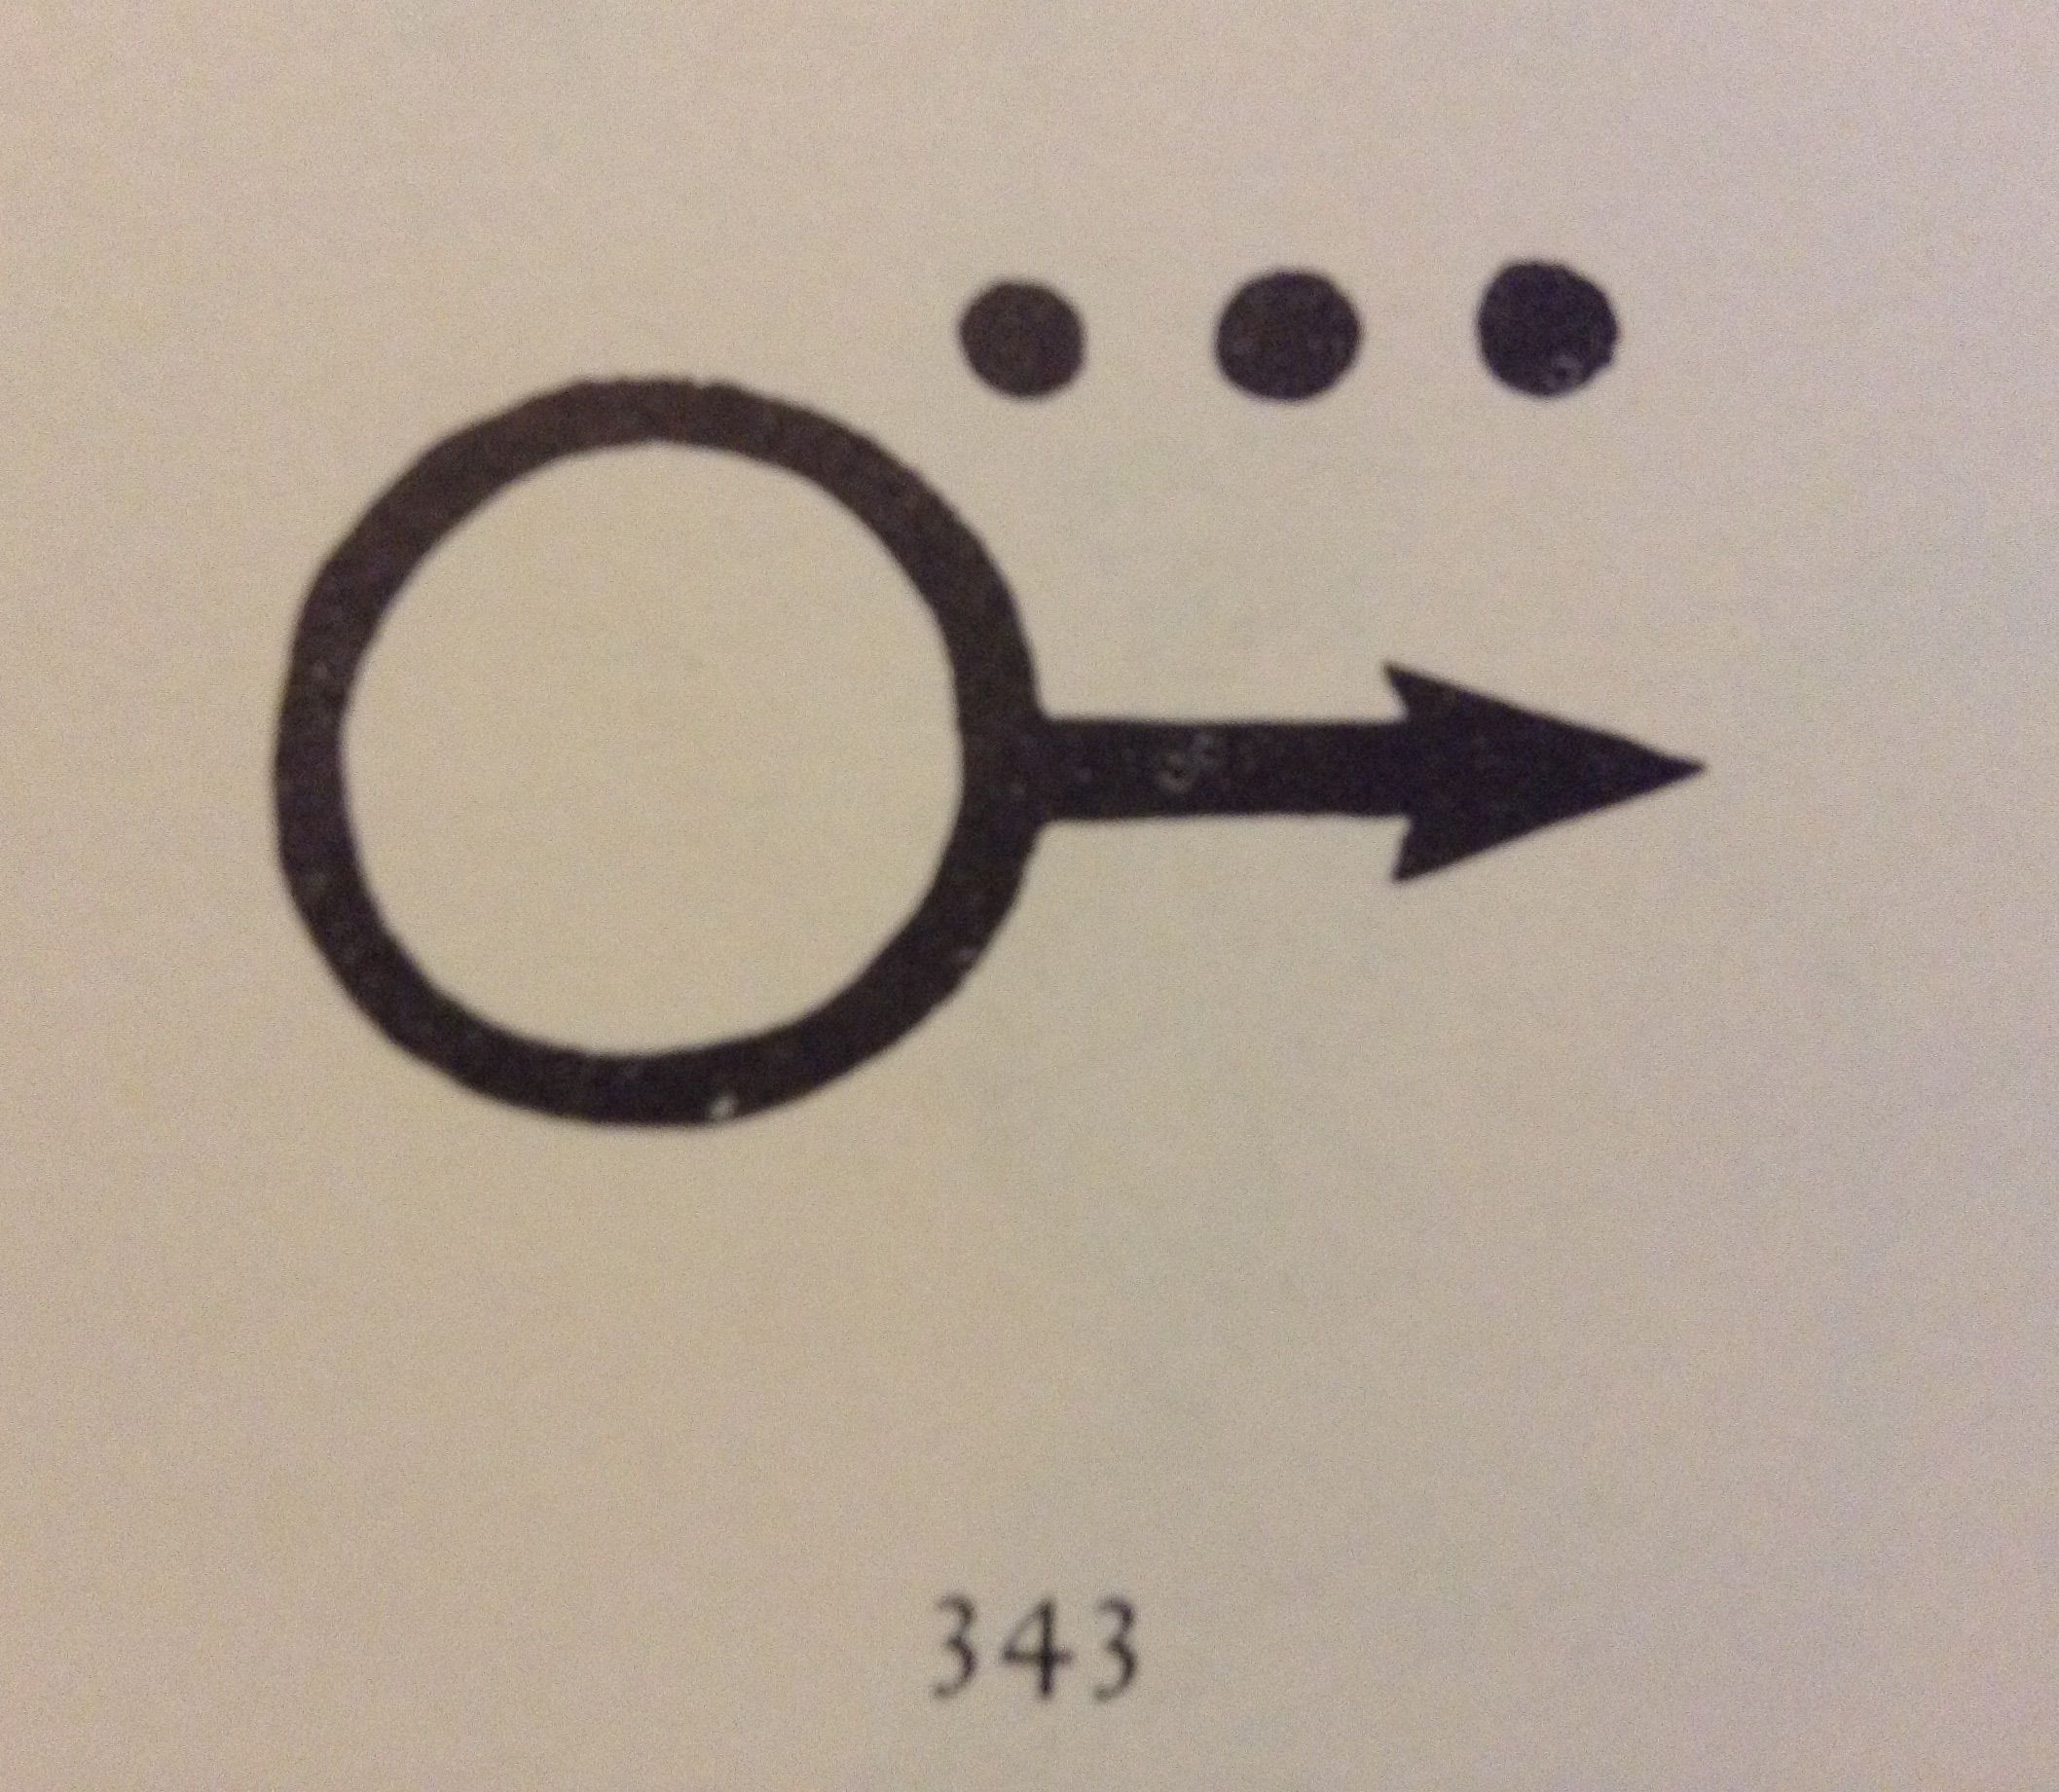 Alchemy Symbol For Iron Filings Tattoo Ideas Pinterest Tatting